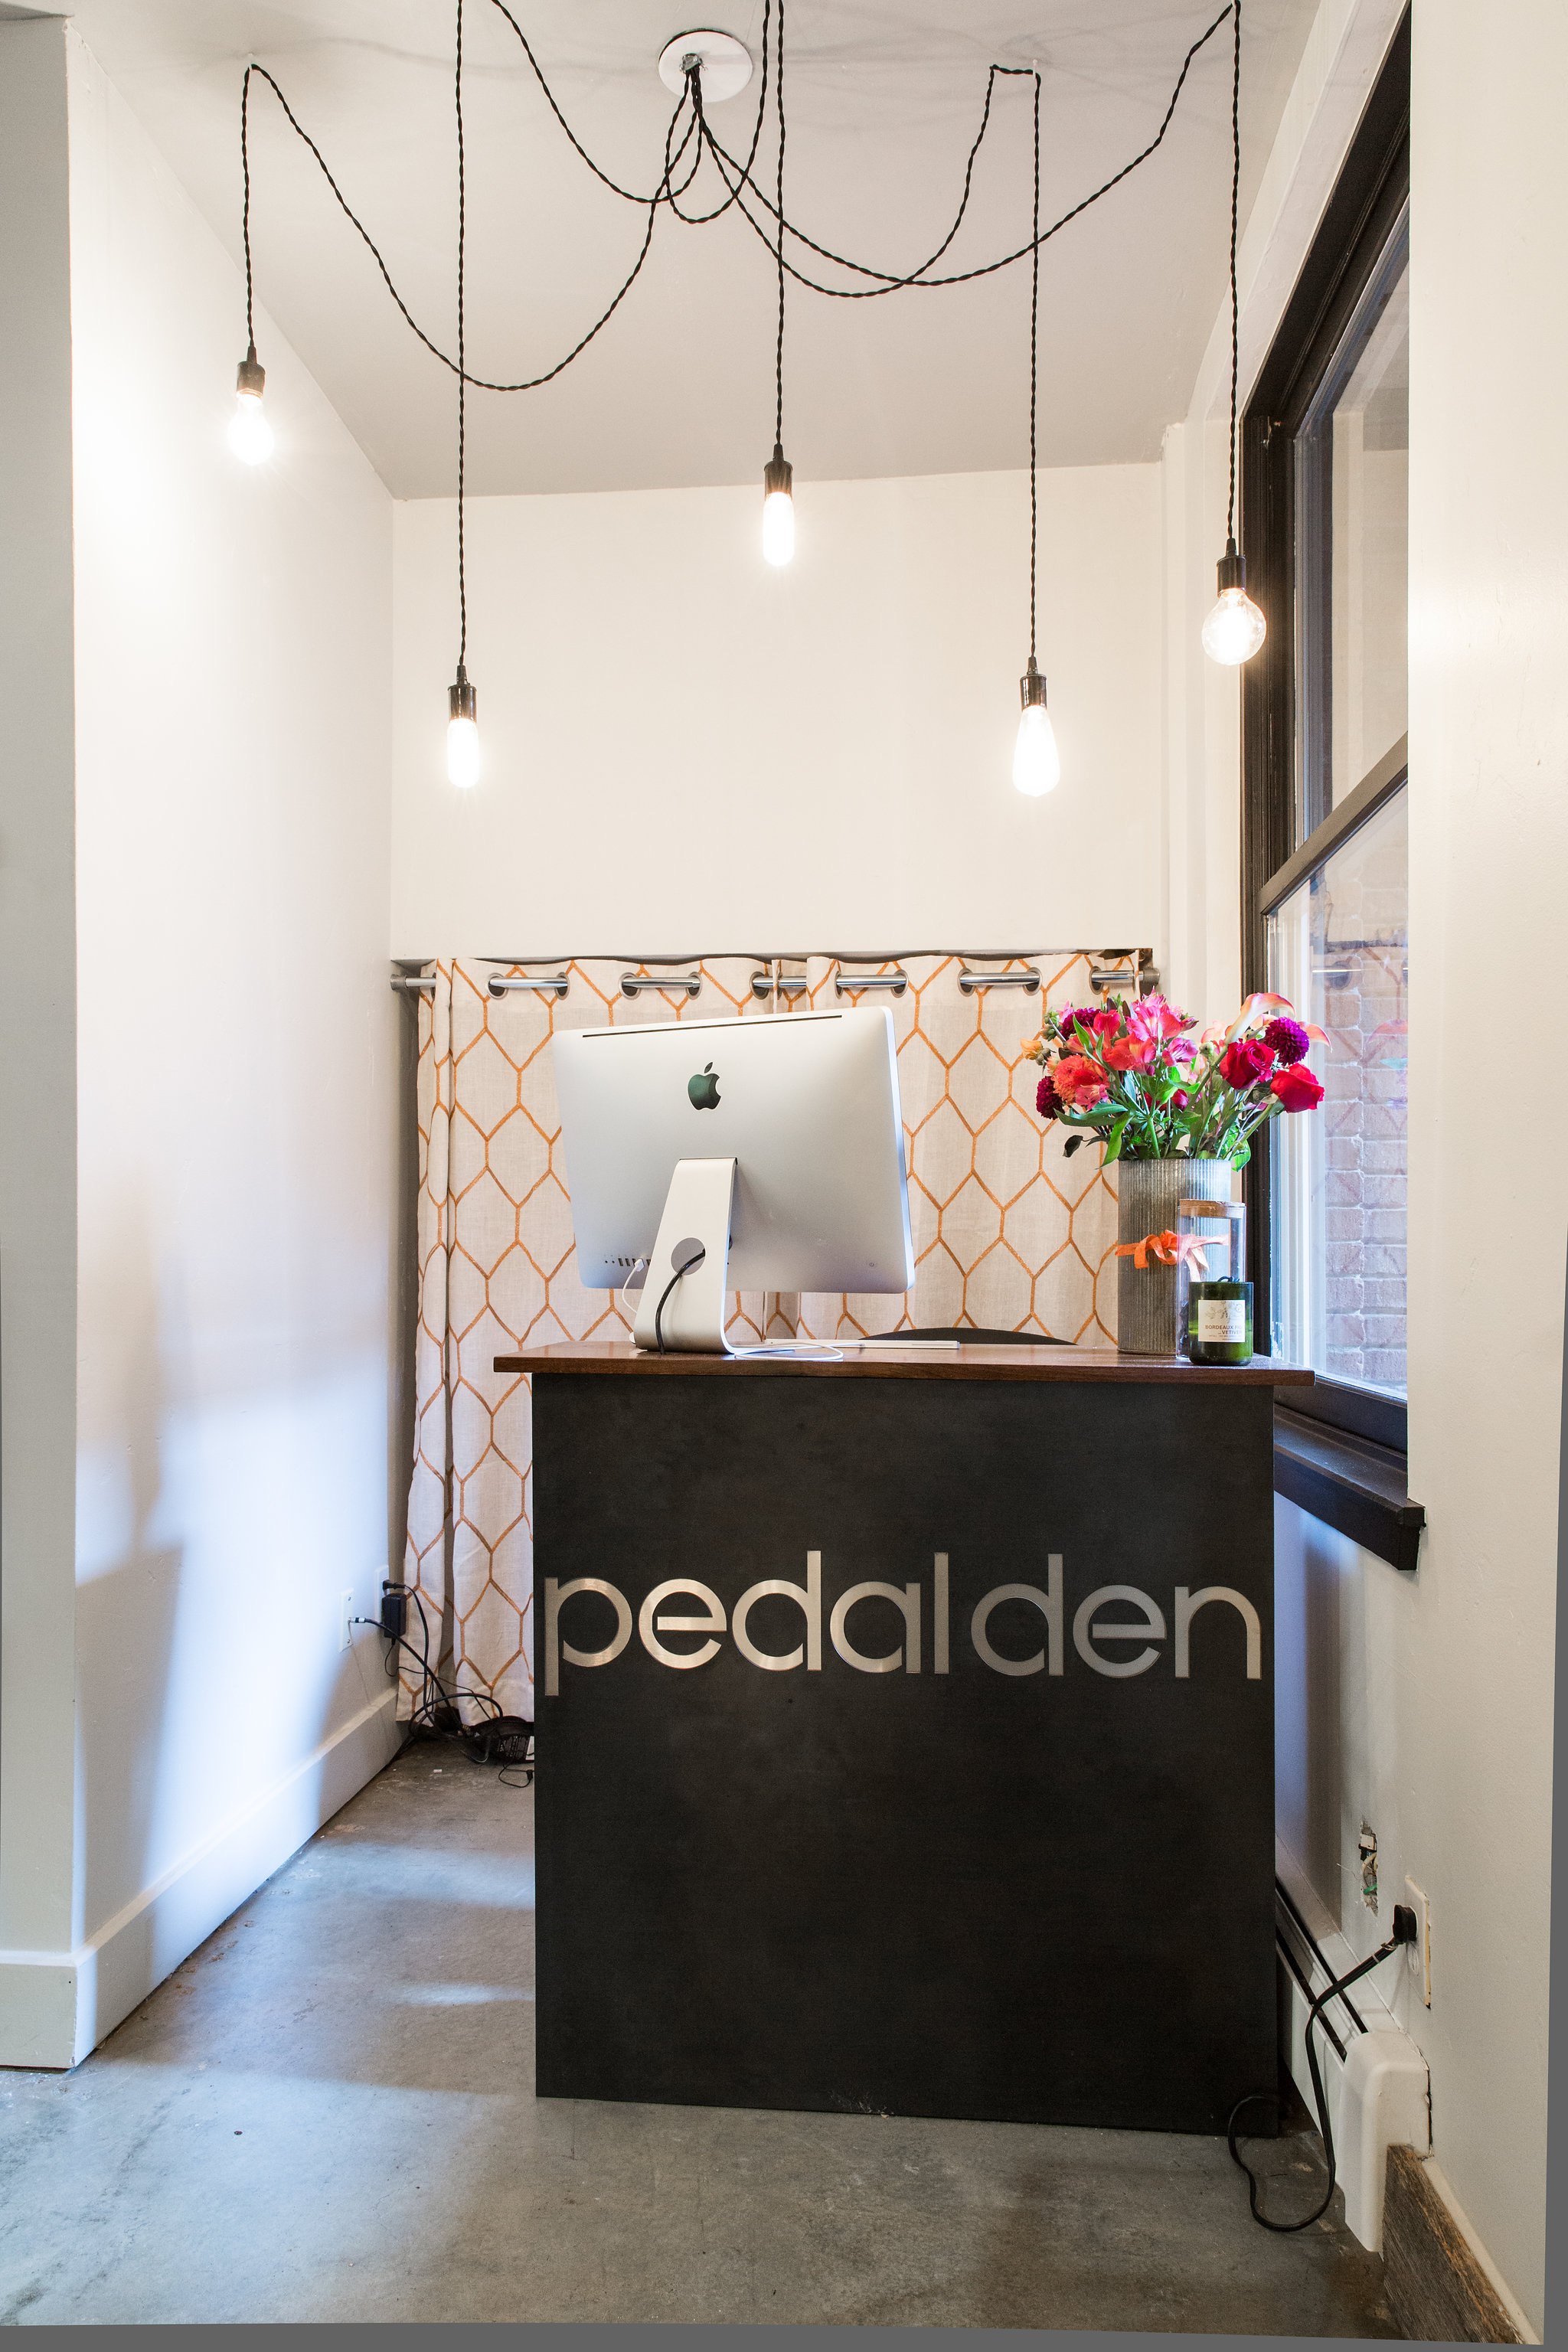 PedalDen-8.jpg